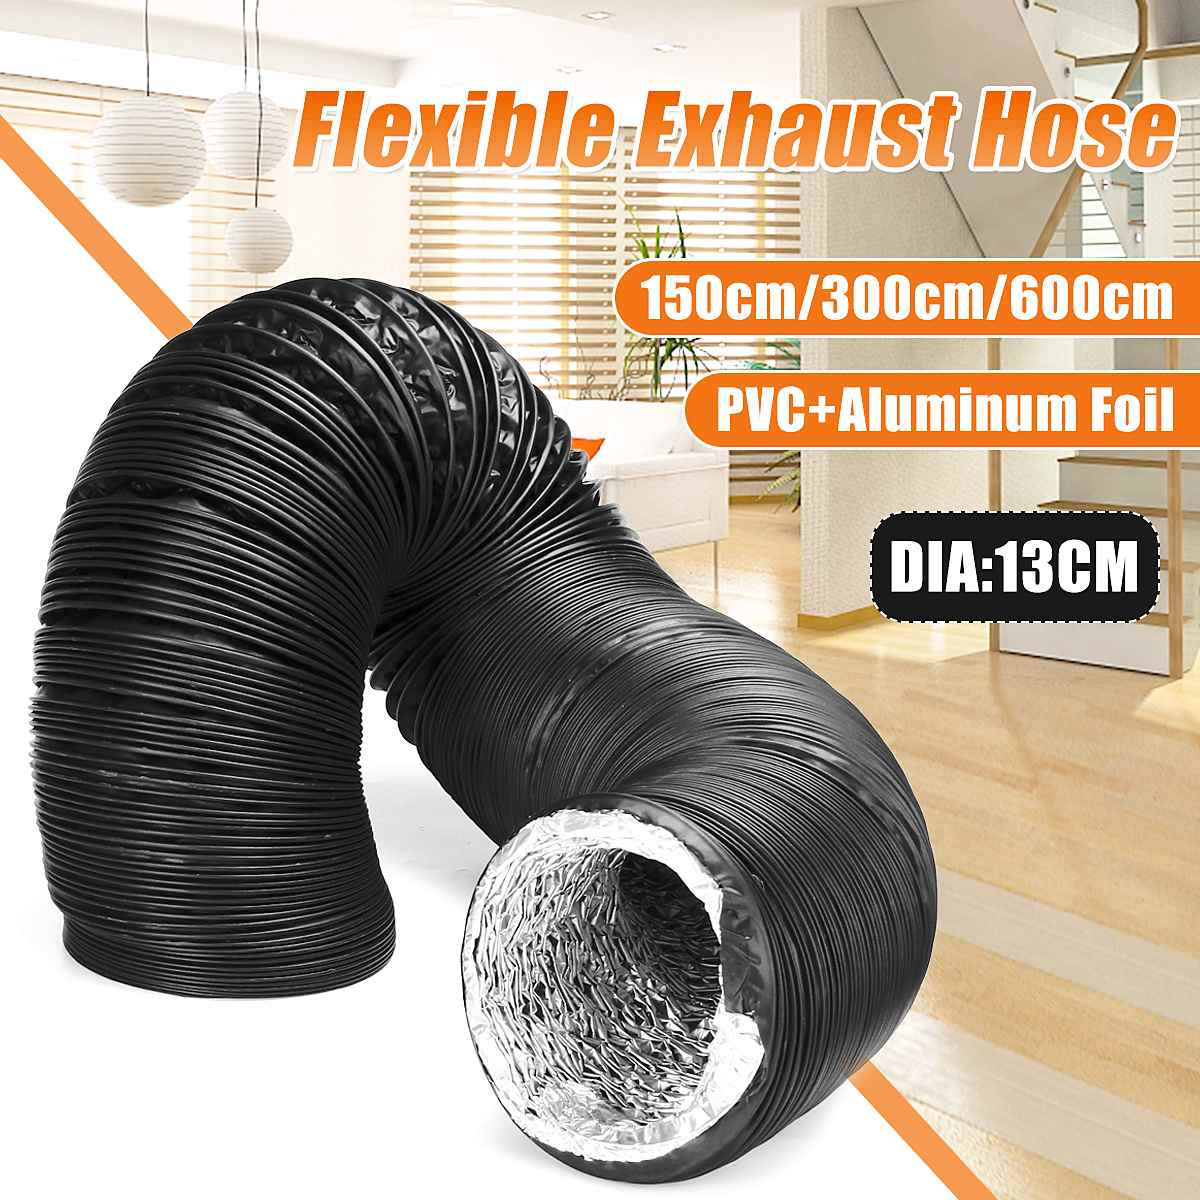 1.5/3/6M Dia.130mm Exhaust Tube PVC Aluminum Air Ventilation Ventilador Extractor Flexible Pipe Hose Kitchen Accessories Tools